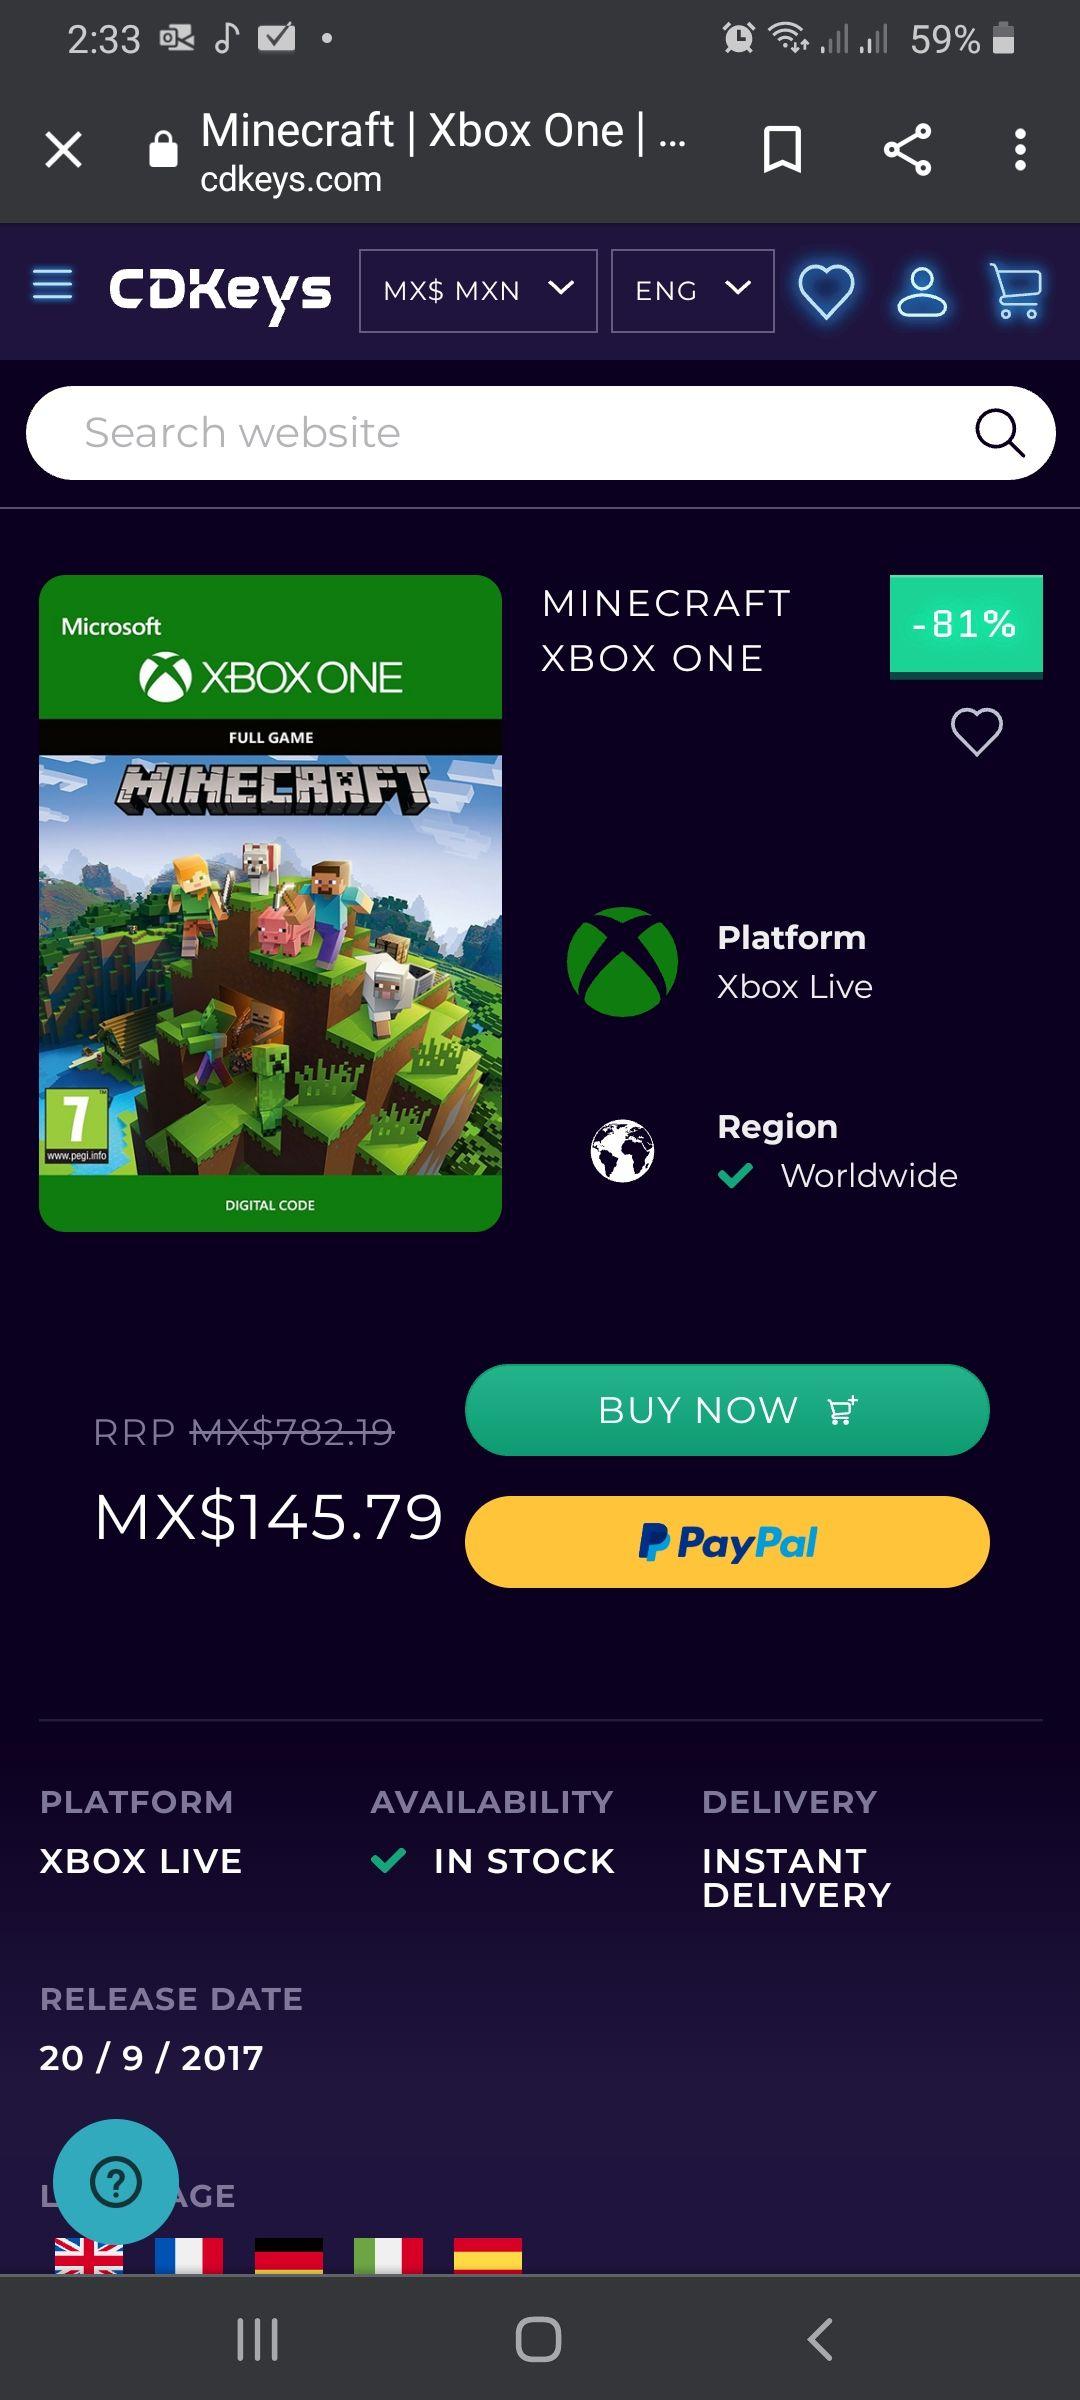 CDKeys: Minecraft Xbox One